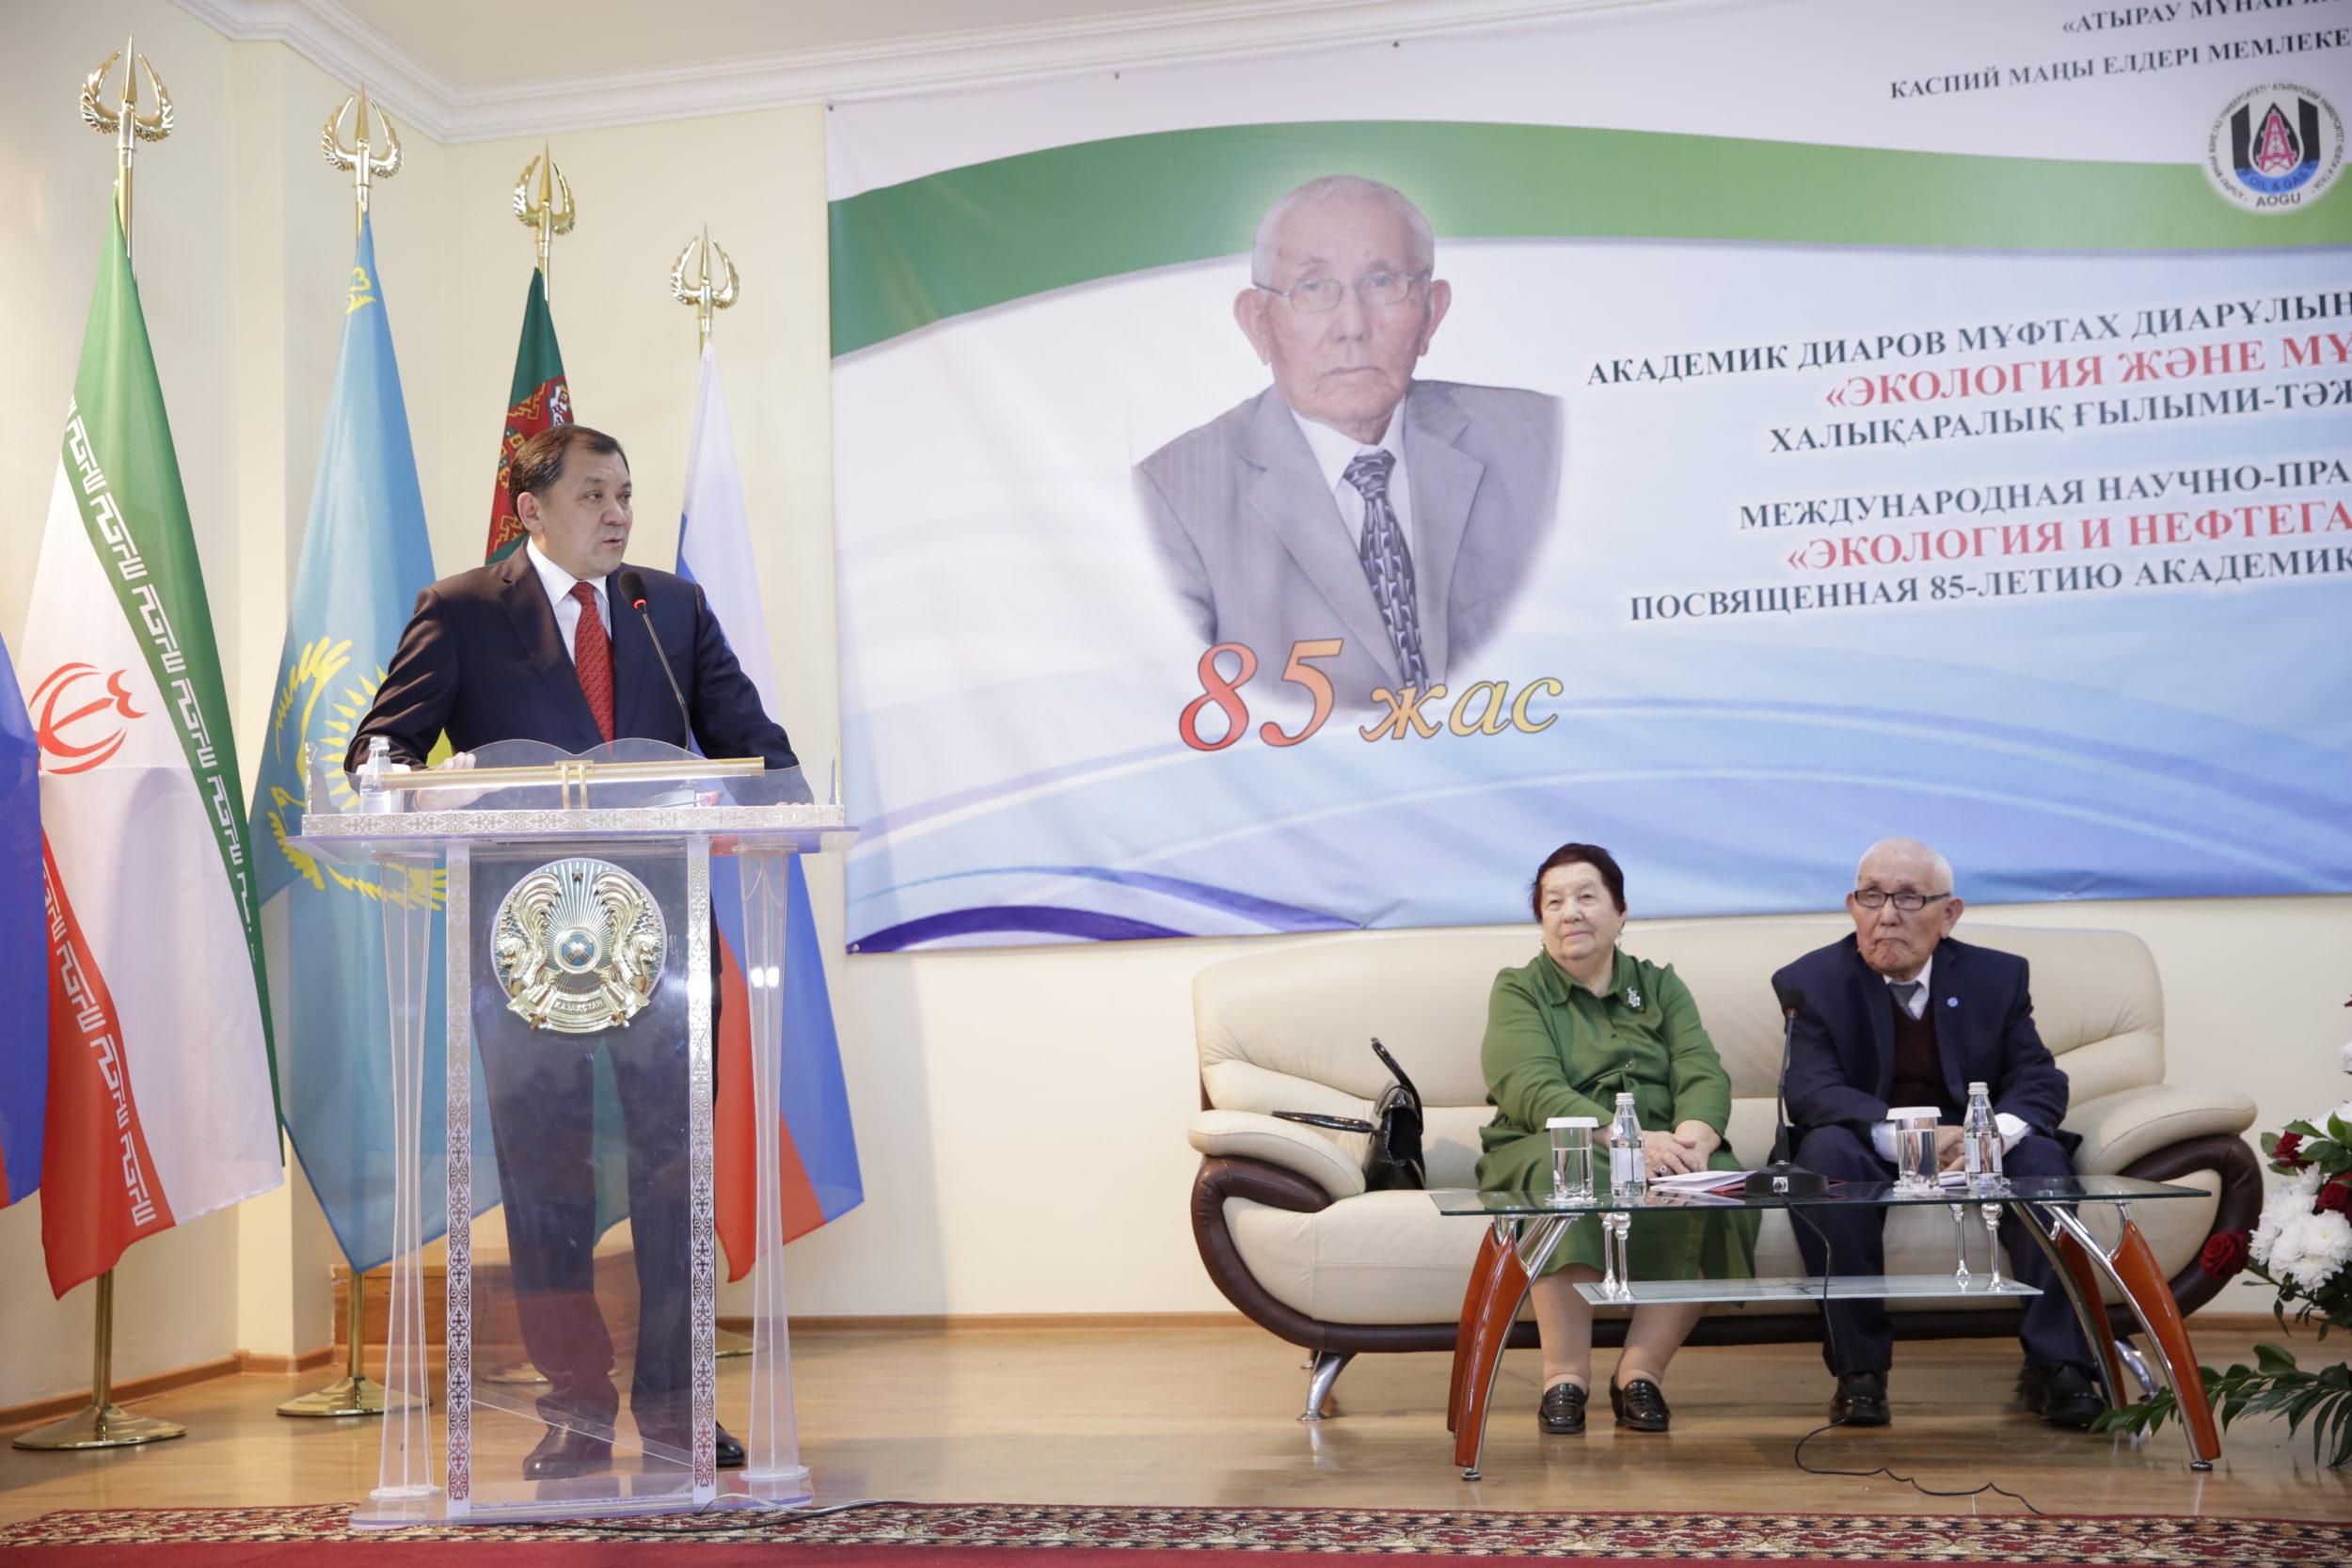 Экология және мұнай-газ конференция